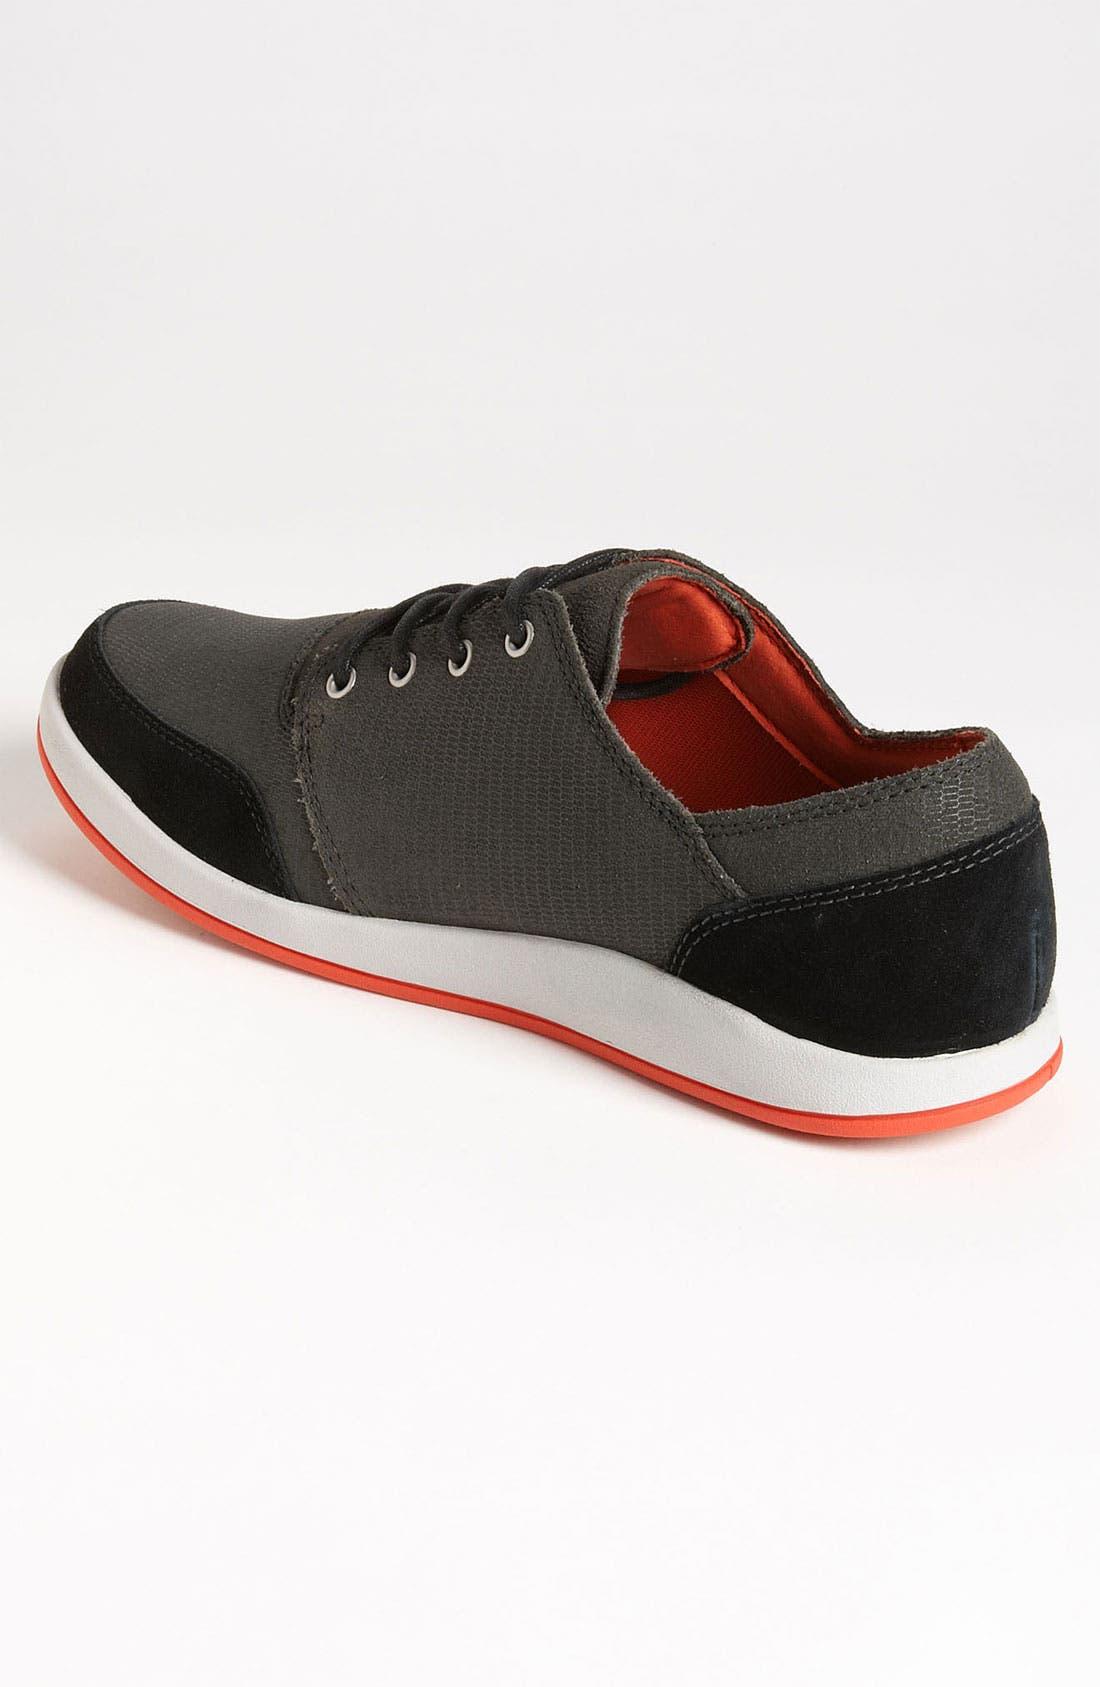 Alternate Image 2  - Chaco 'Brody' Sneaker